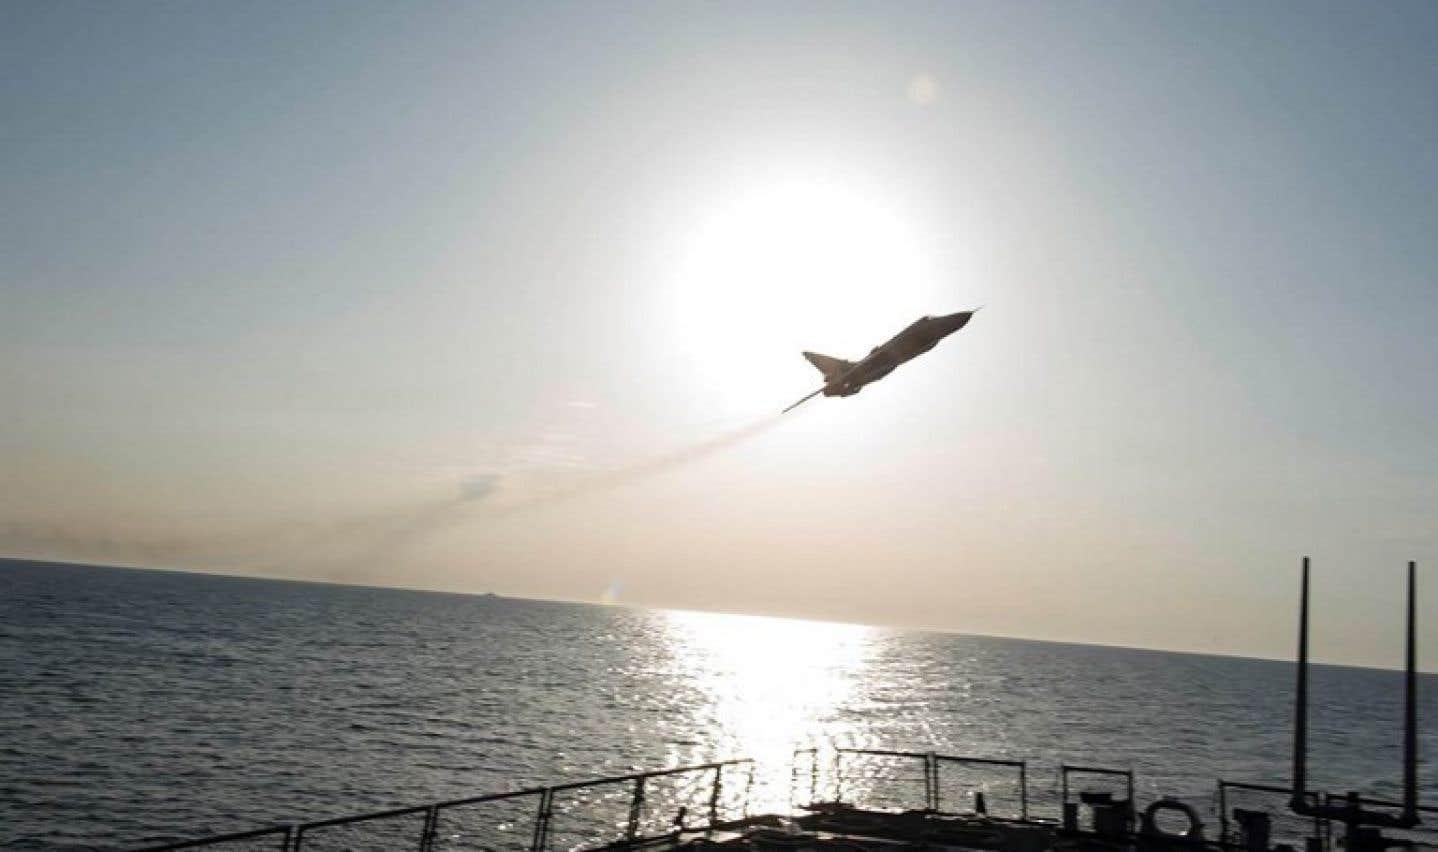 Un avion russe abattu par un groupe djihadiste en Syrie